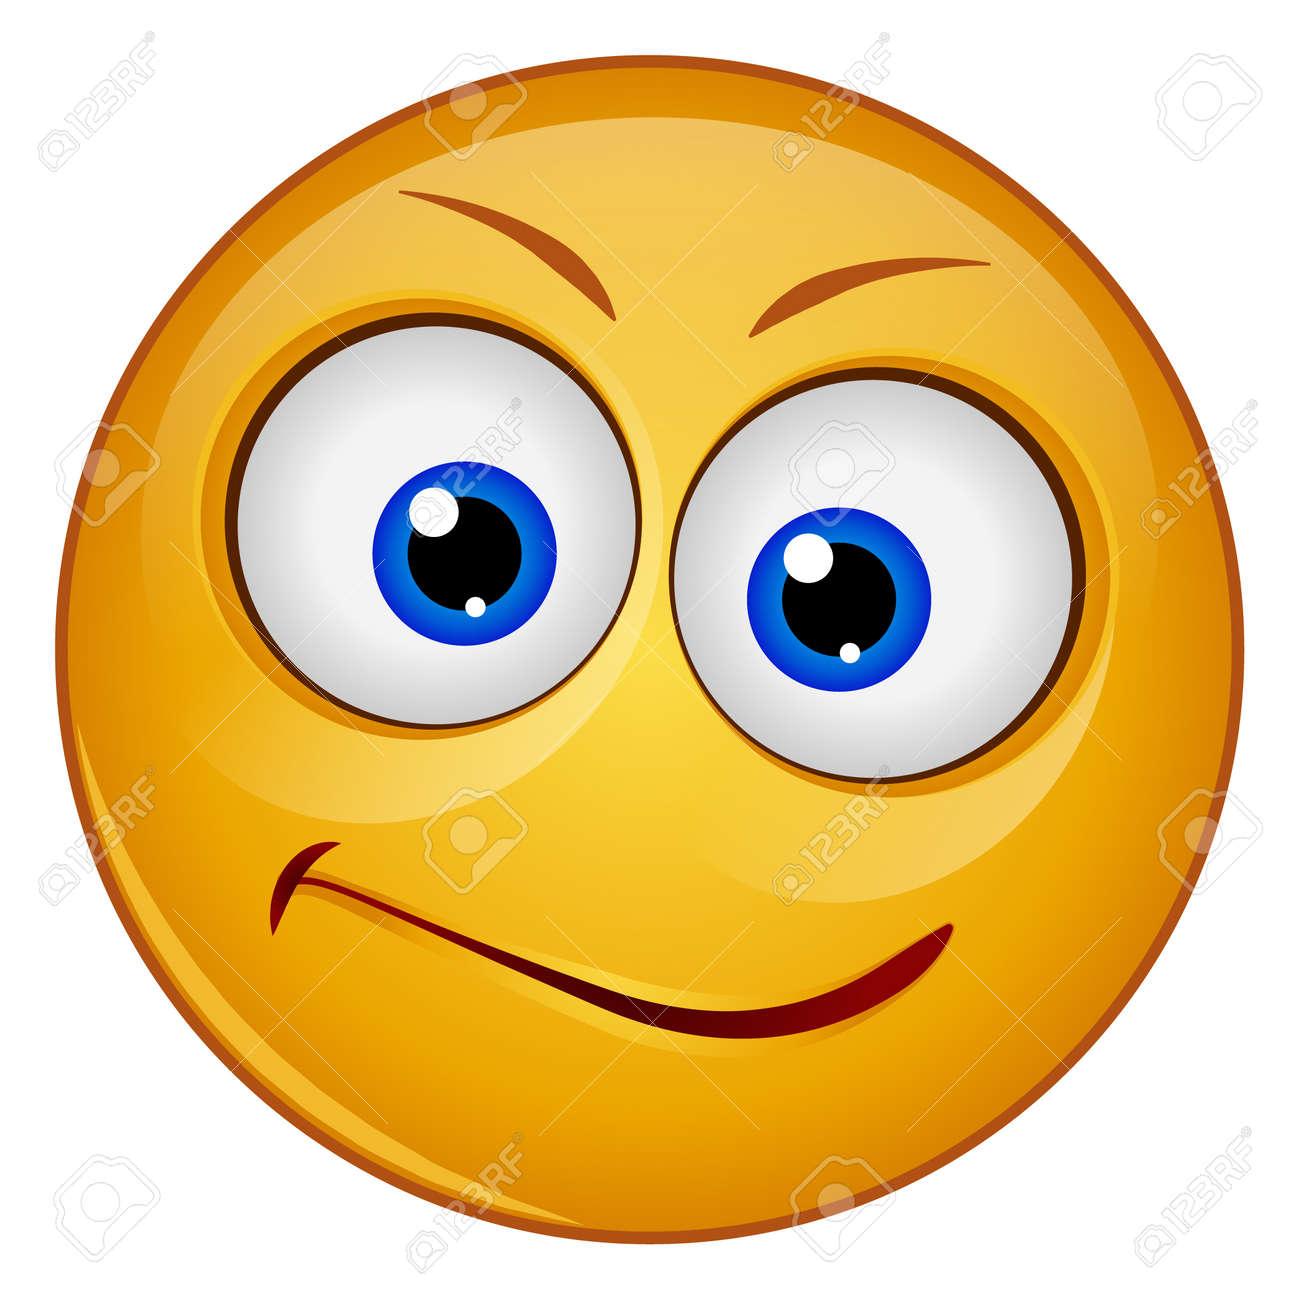 Gradient color icon for emoji face. - 158142557